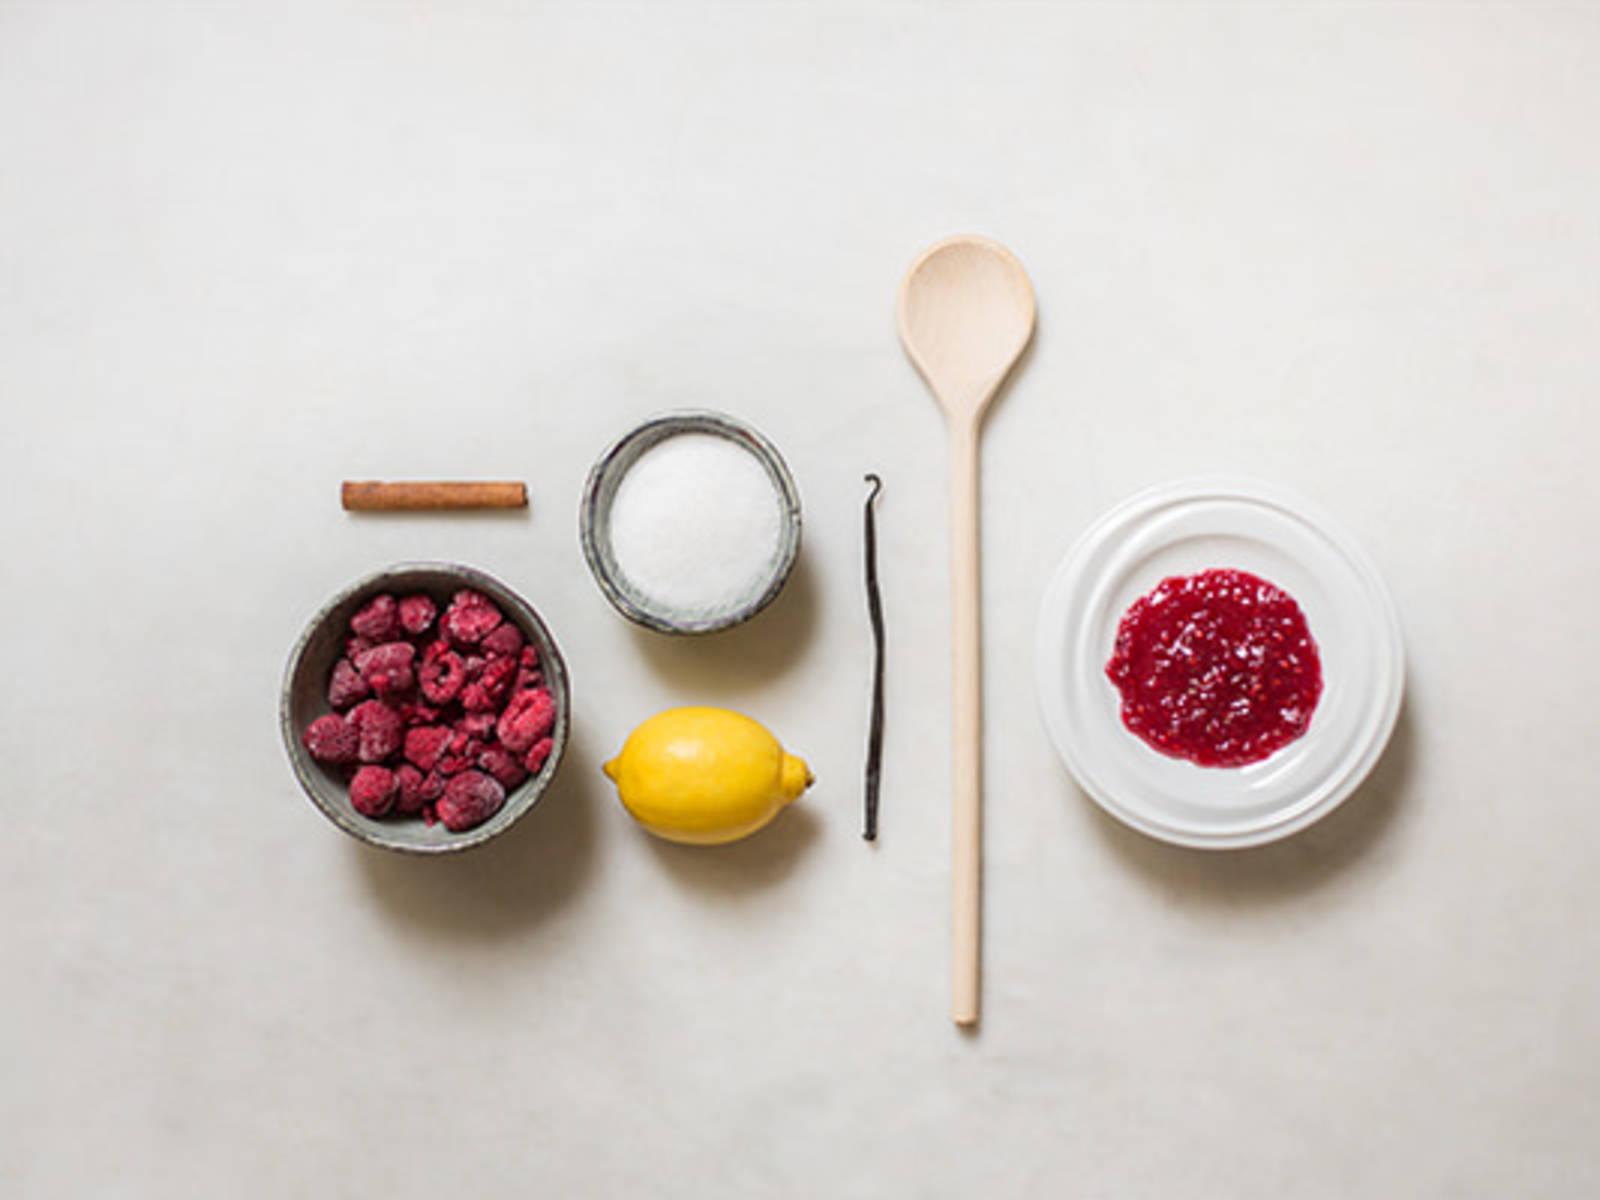 Homemade aromatic fruit jam